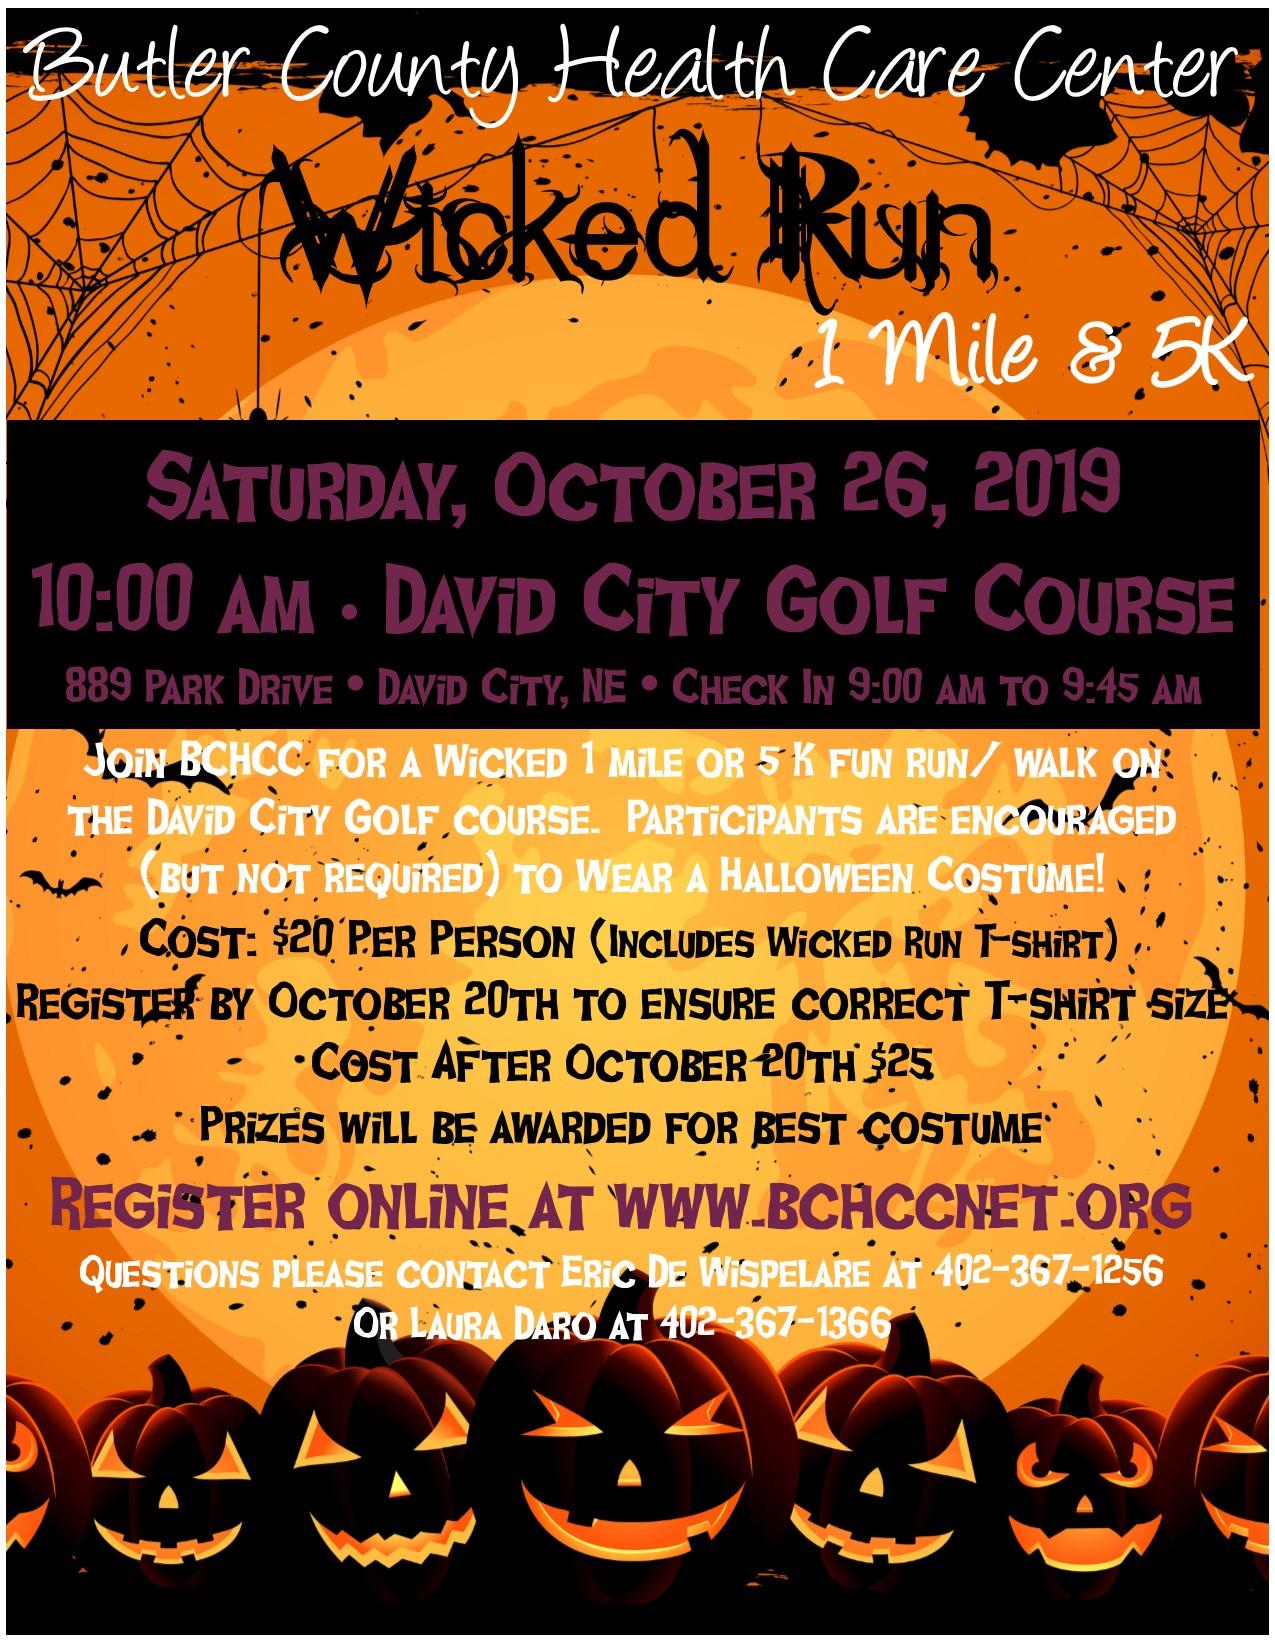 WICKED RUN - Butler County Health Care Center - 1 mile & 5K Run